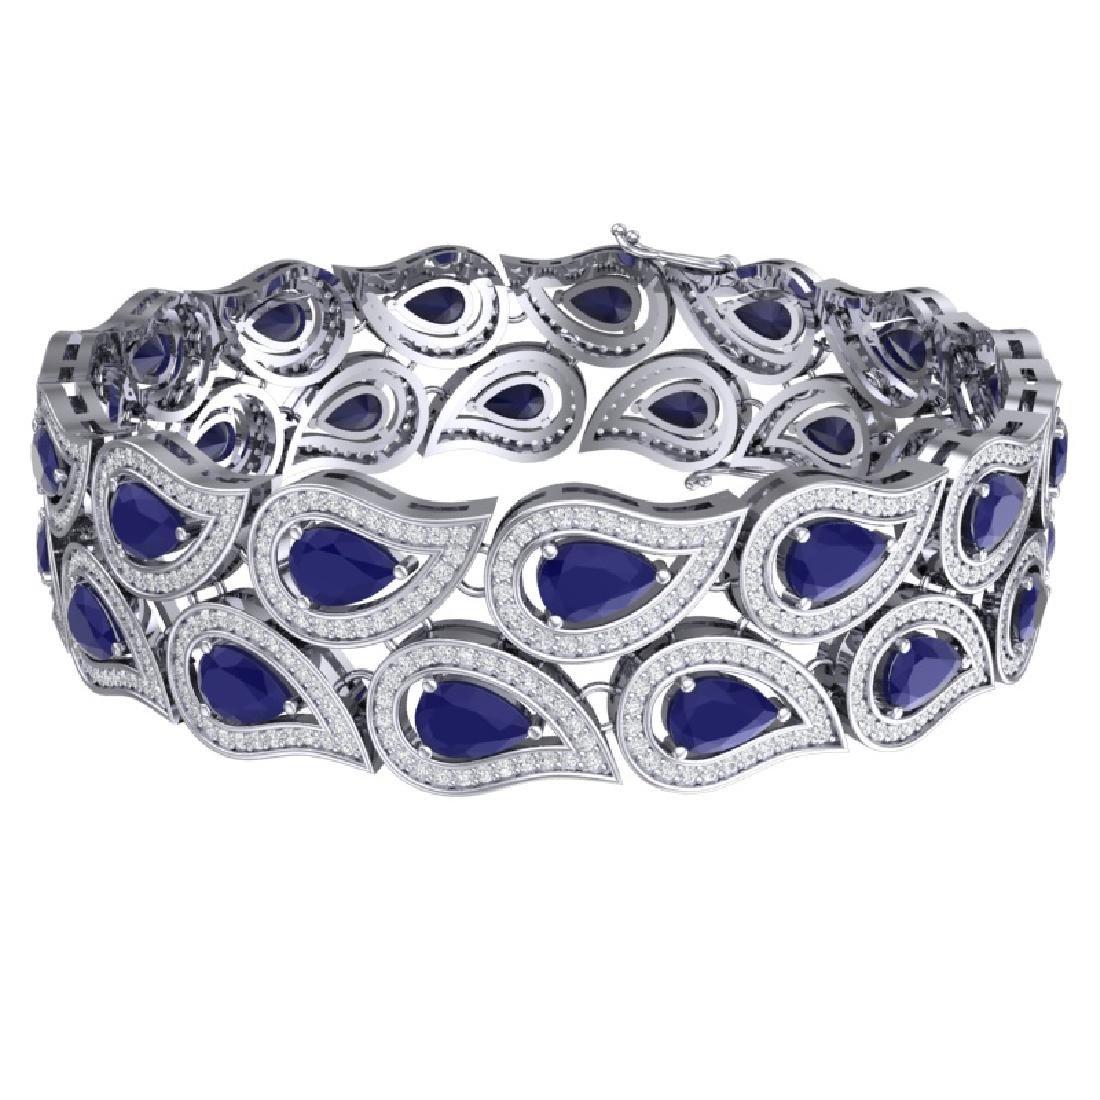 20.1 CTW Royalty Sapphire & VS Diamond Bracelet 18K - 3